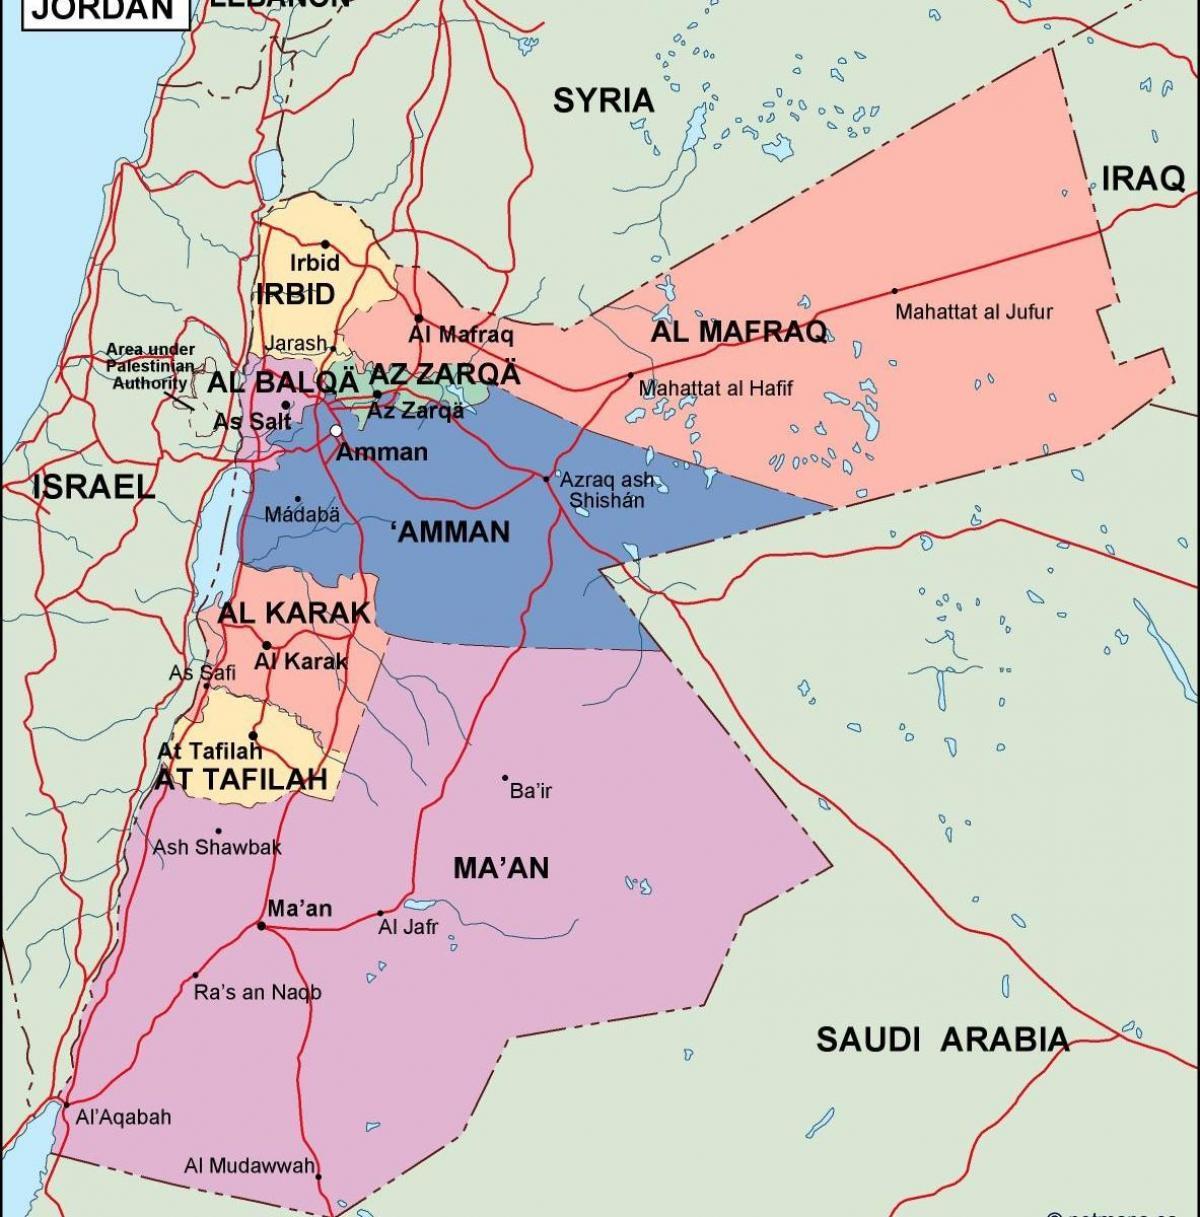 Politische Karte Asien.Jordan Politischen Landkarte Karte Von Jordanien Politischen West